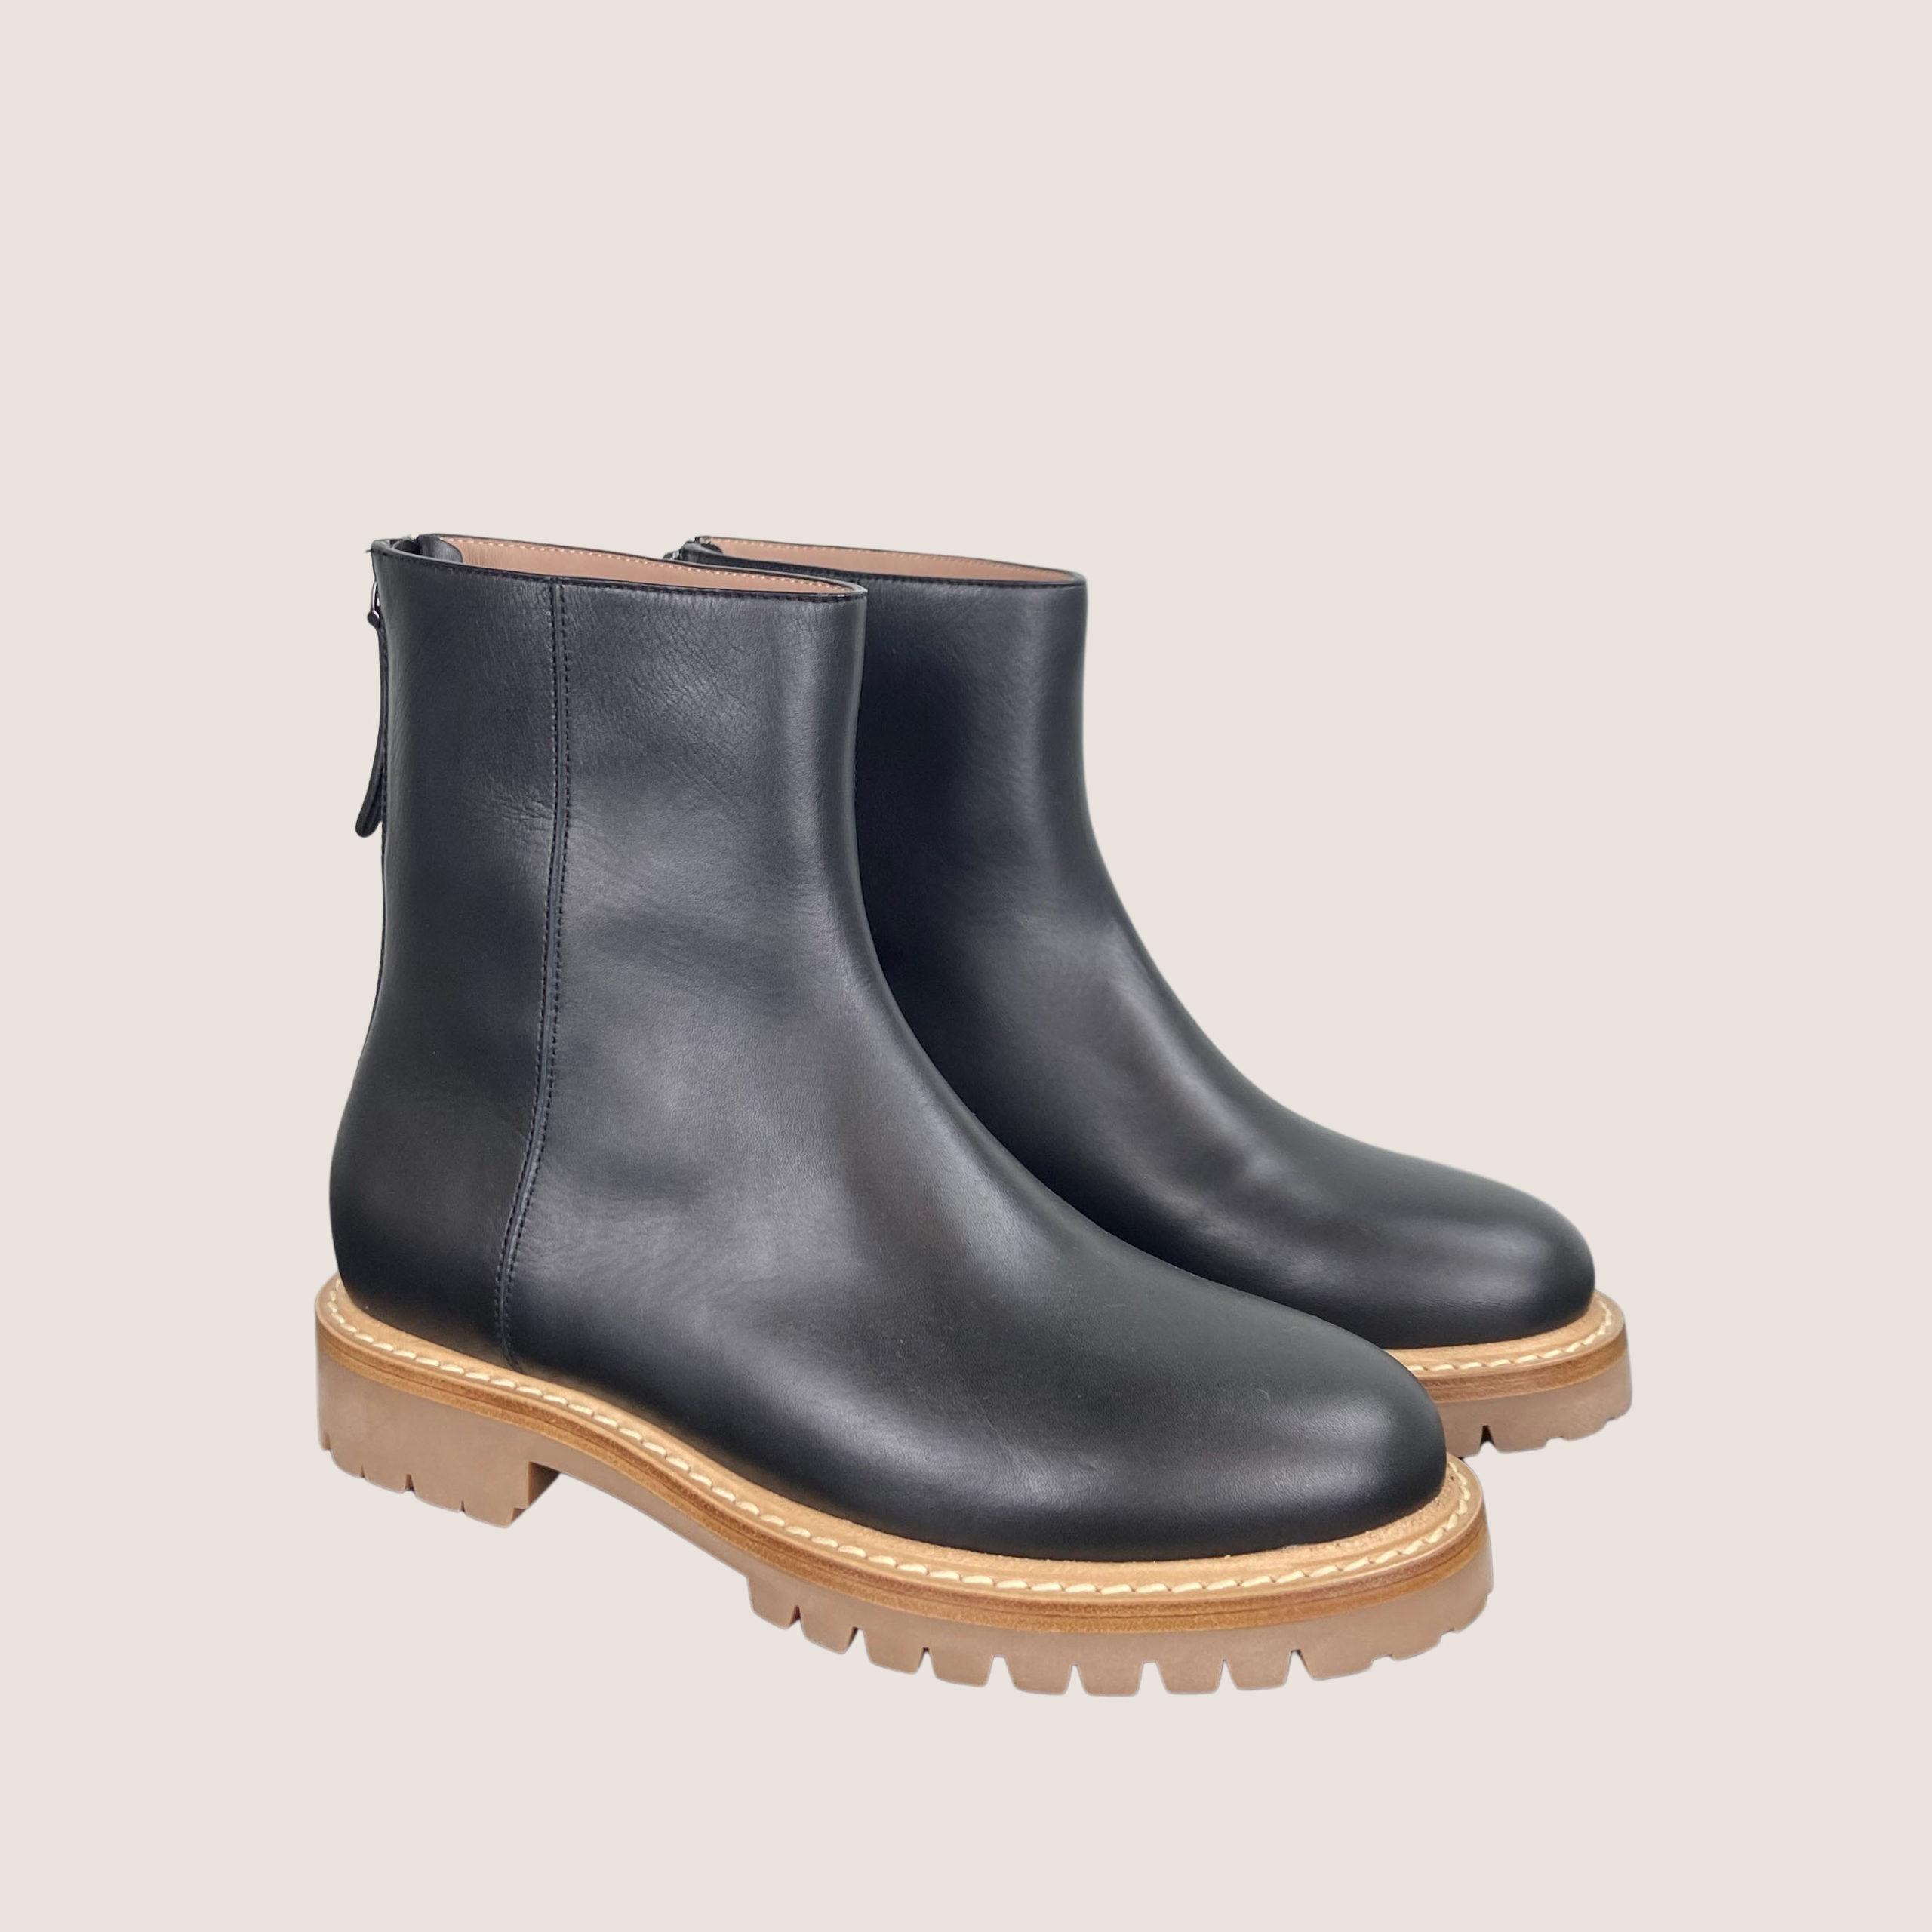 New Officer Boot